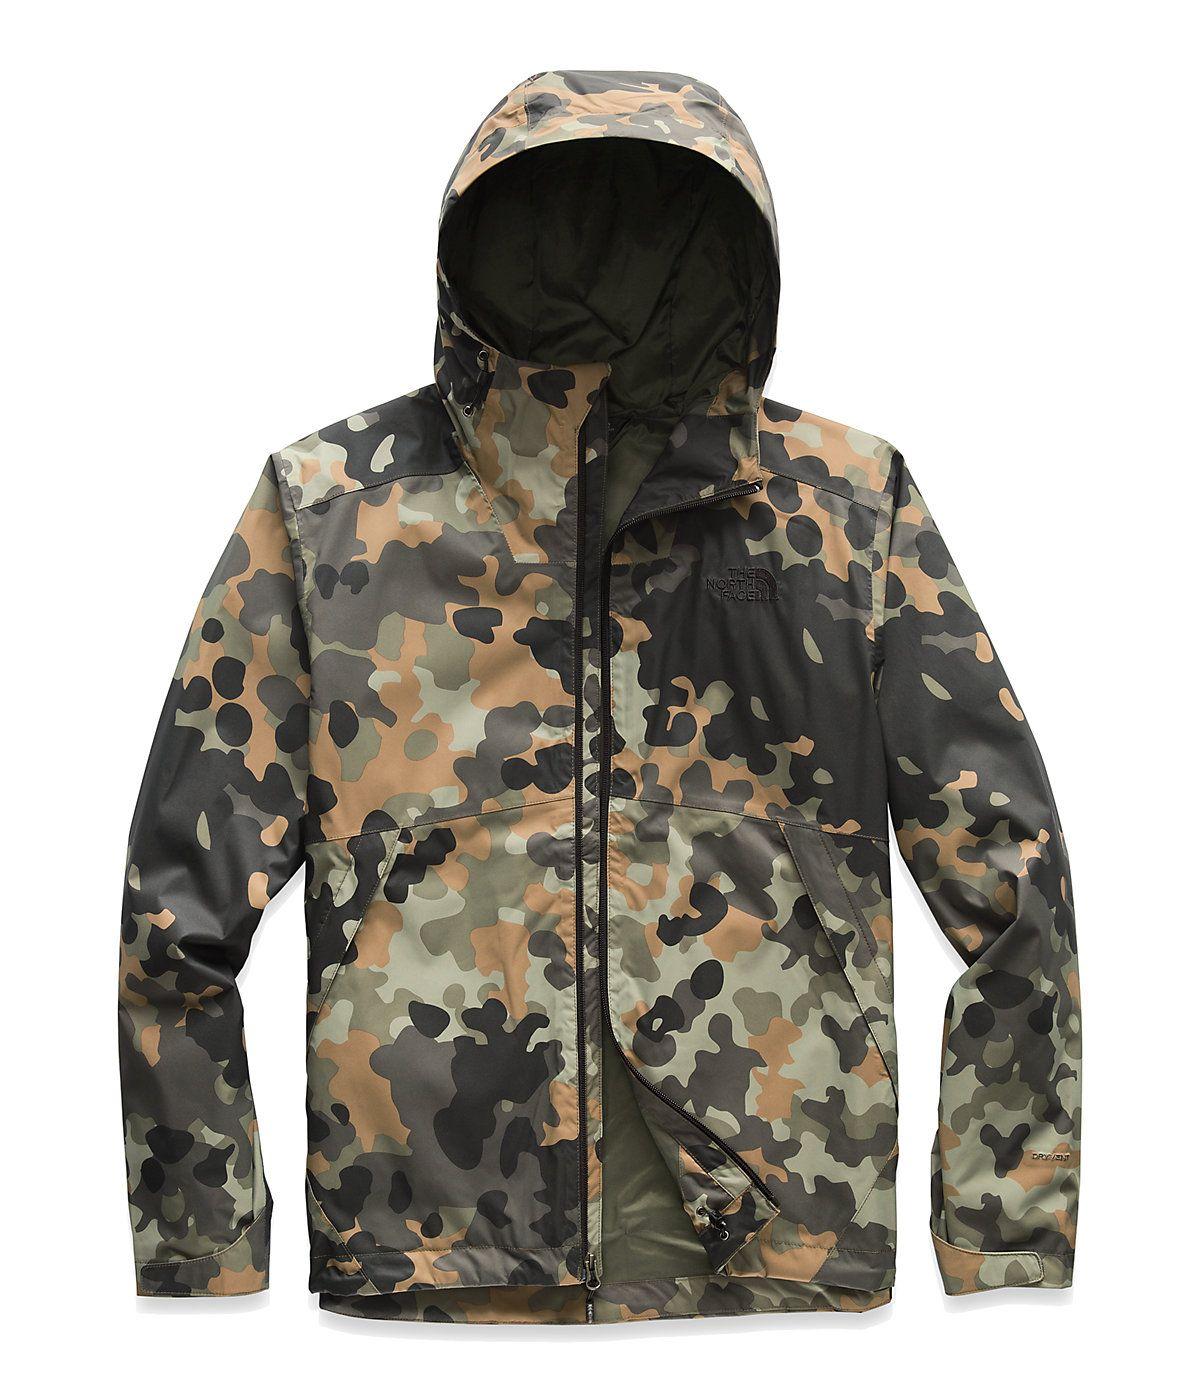 329d730f5 Men's millerton jacket in 2019 | Products | Rain jacket, Jackets ...